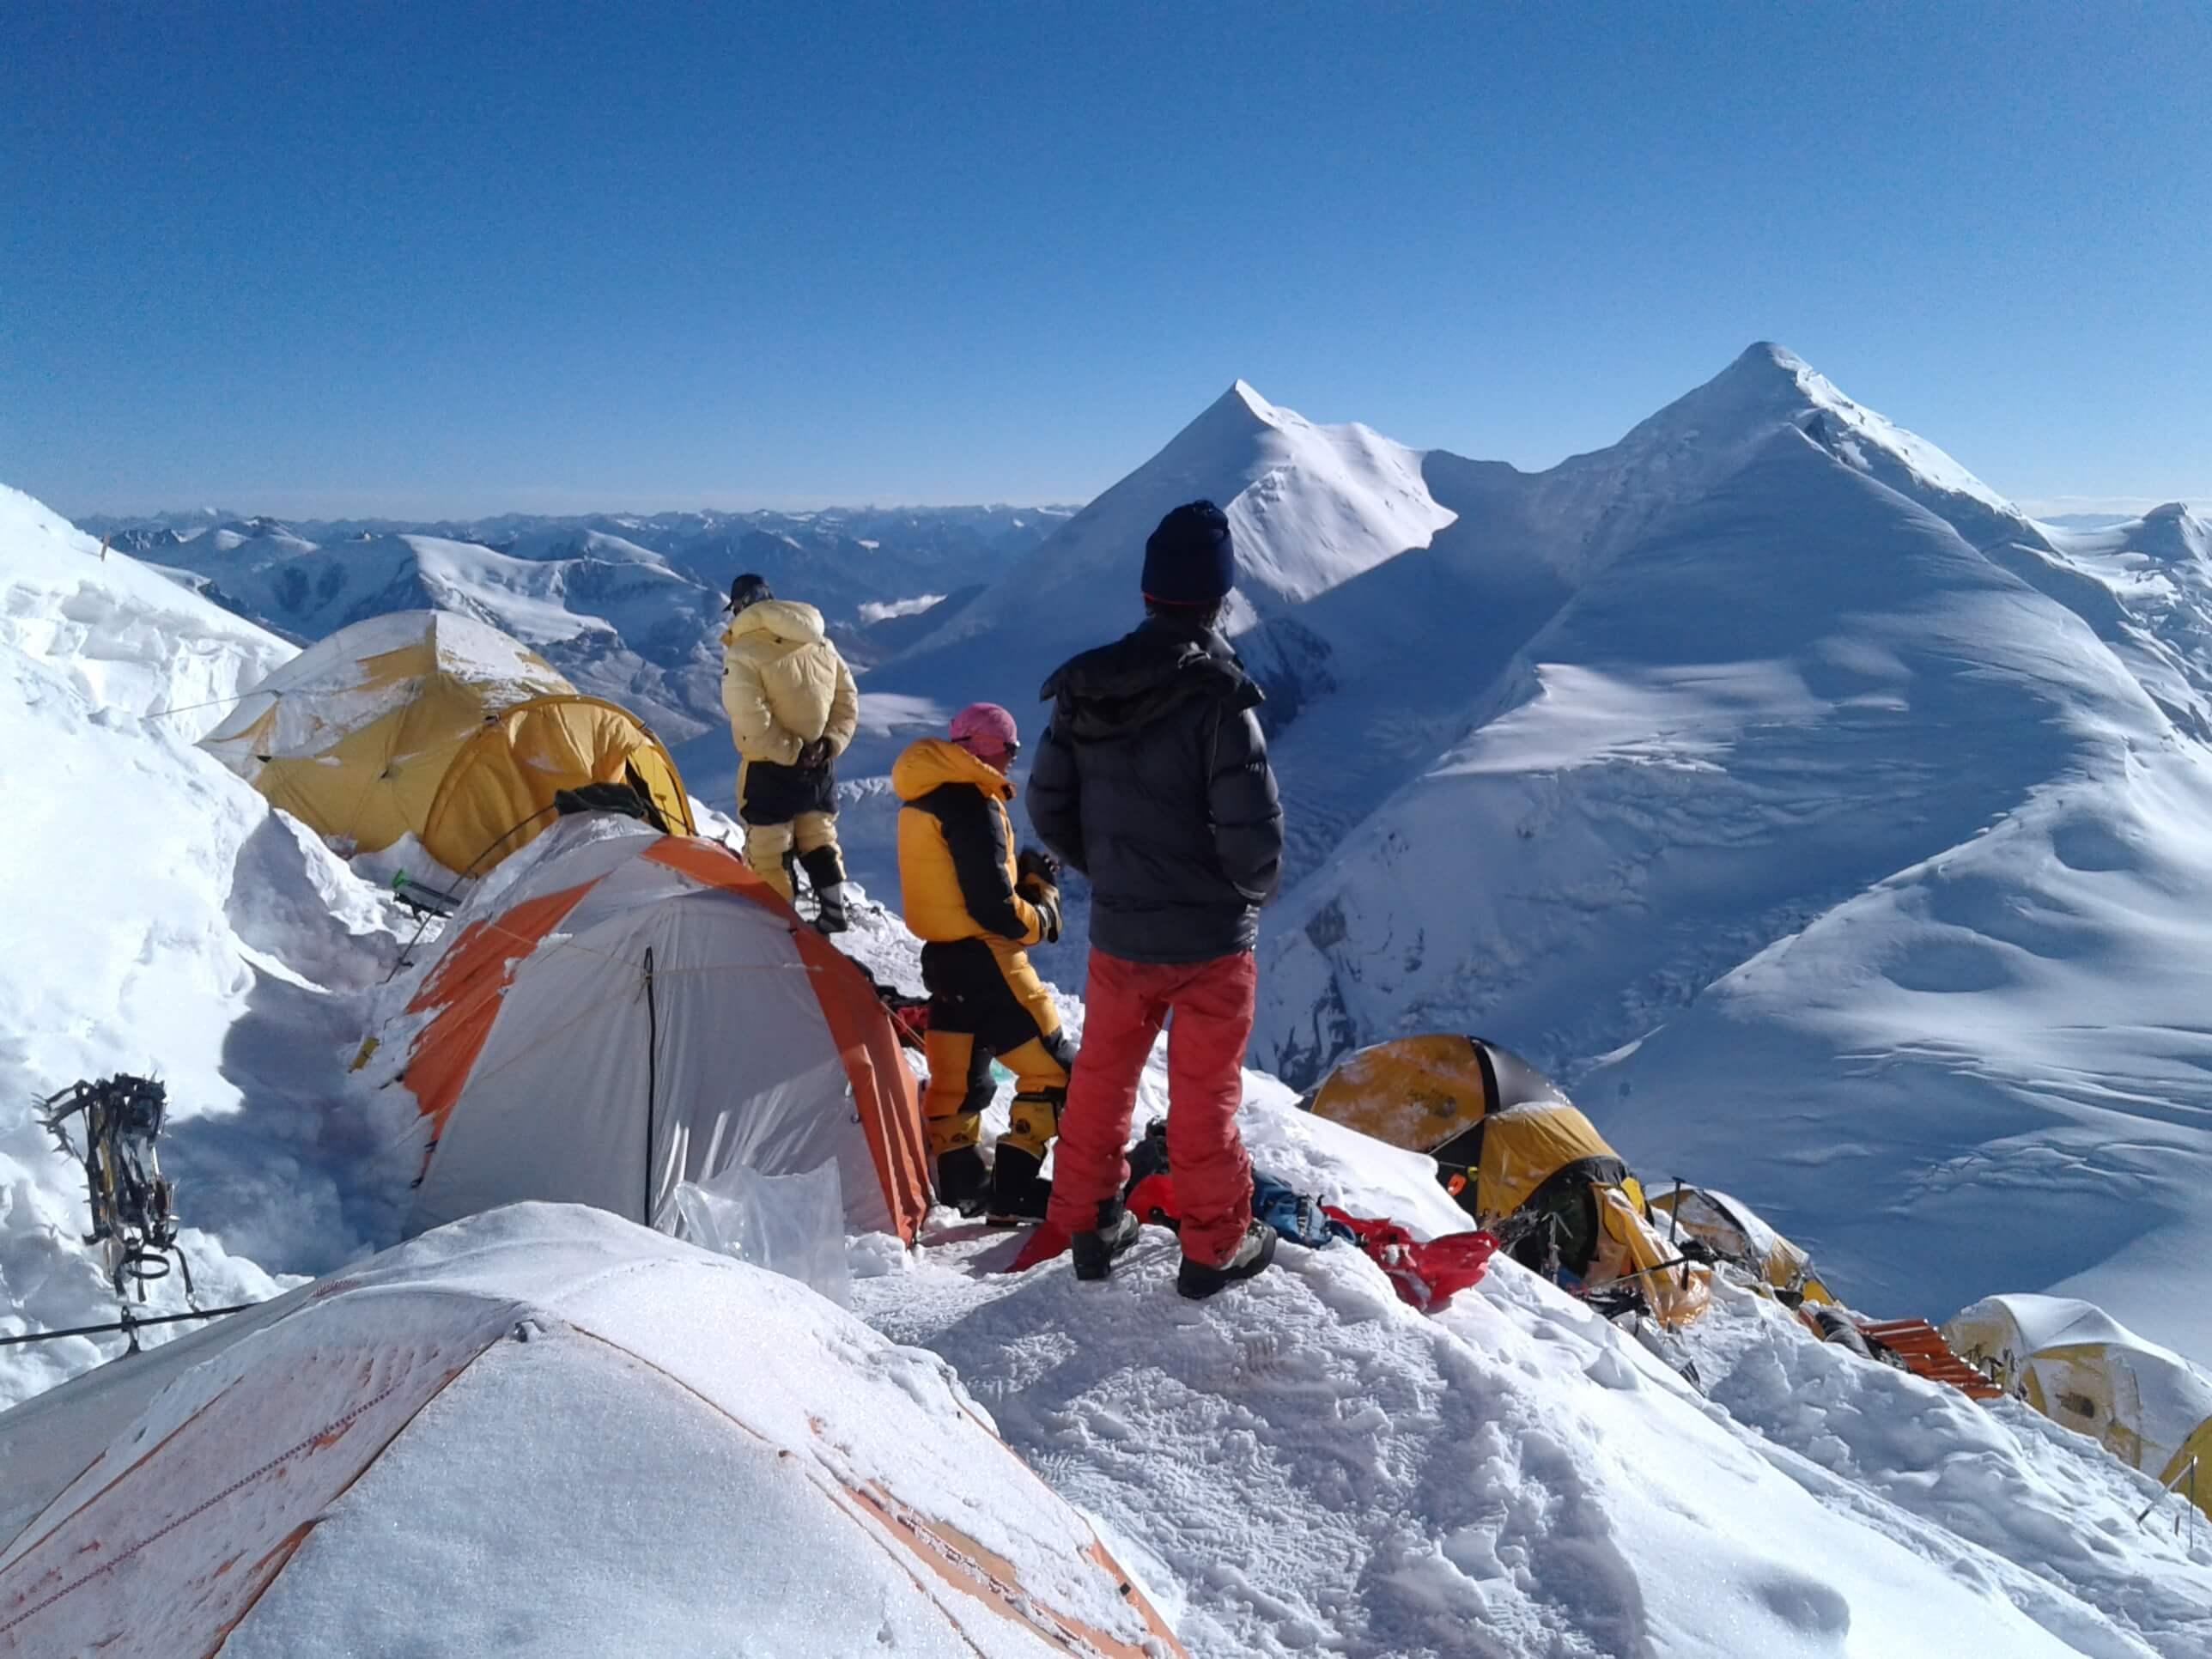 Best Treks to do in Nepal in 2 Weeks